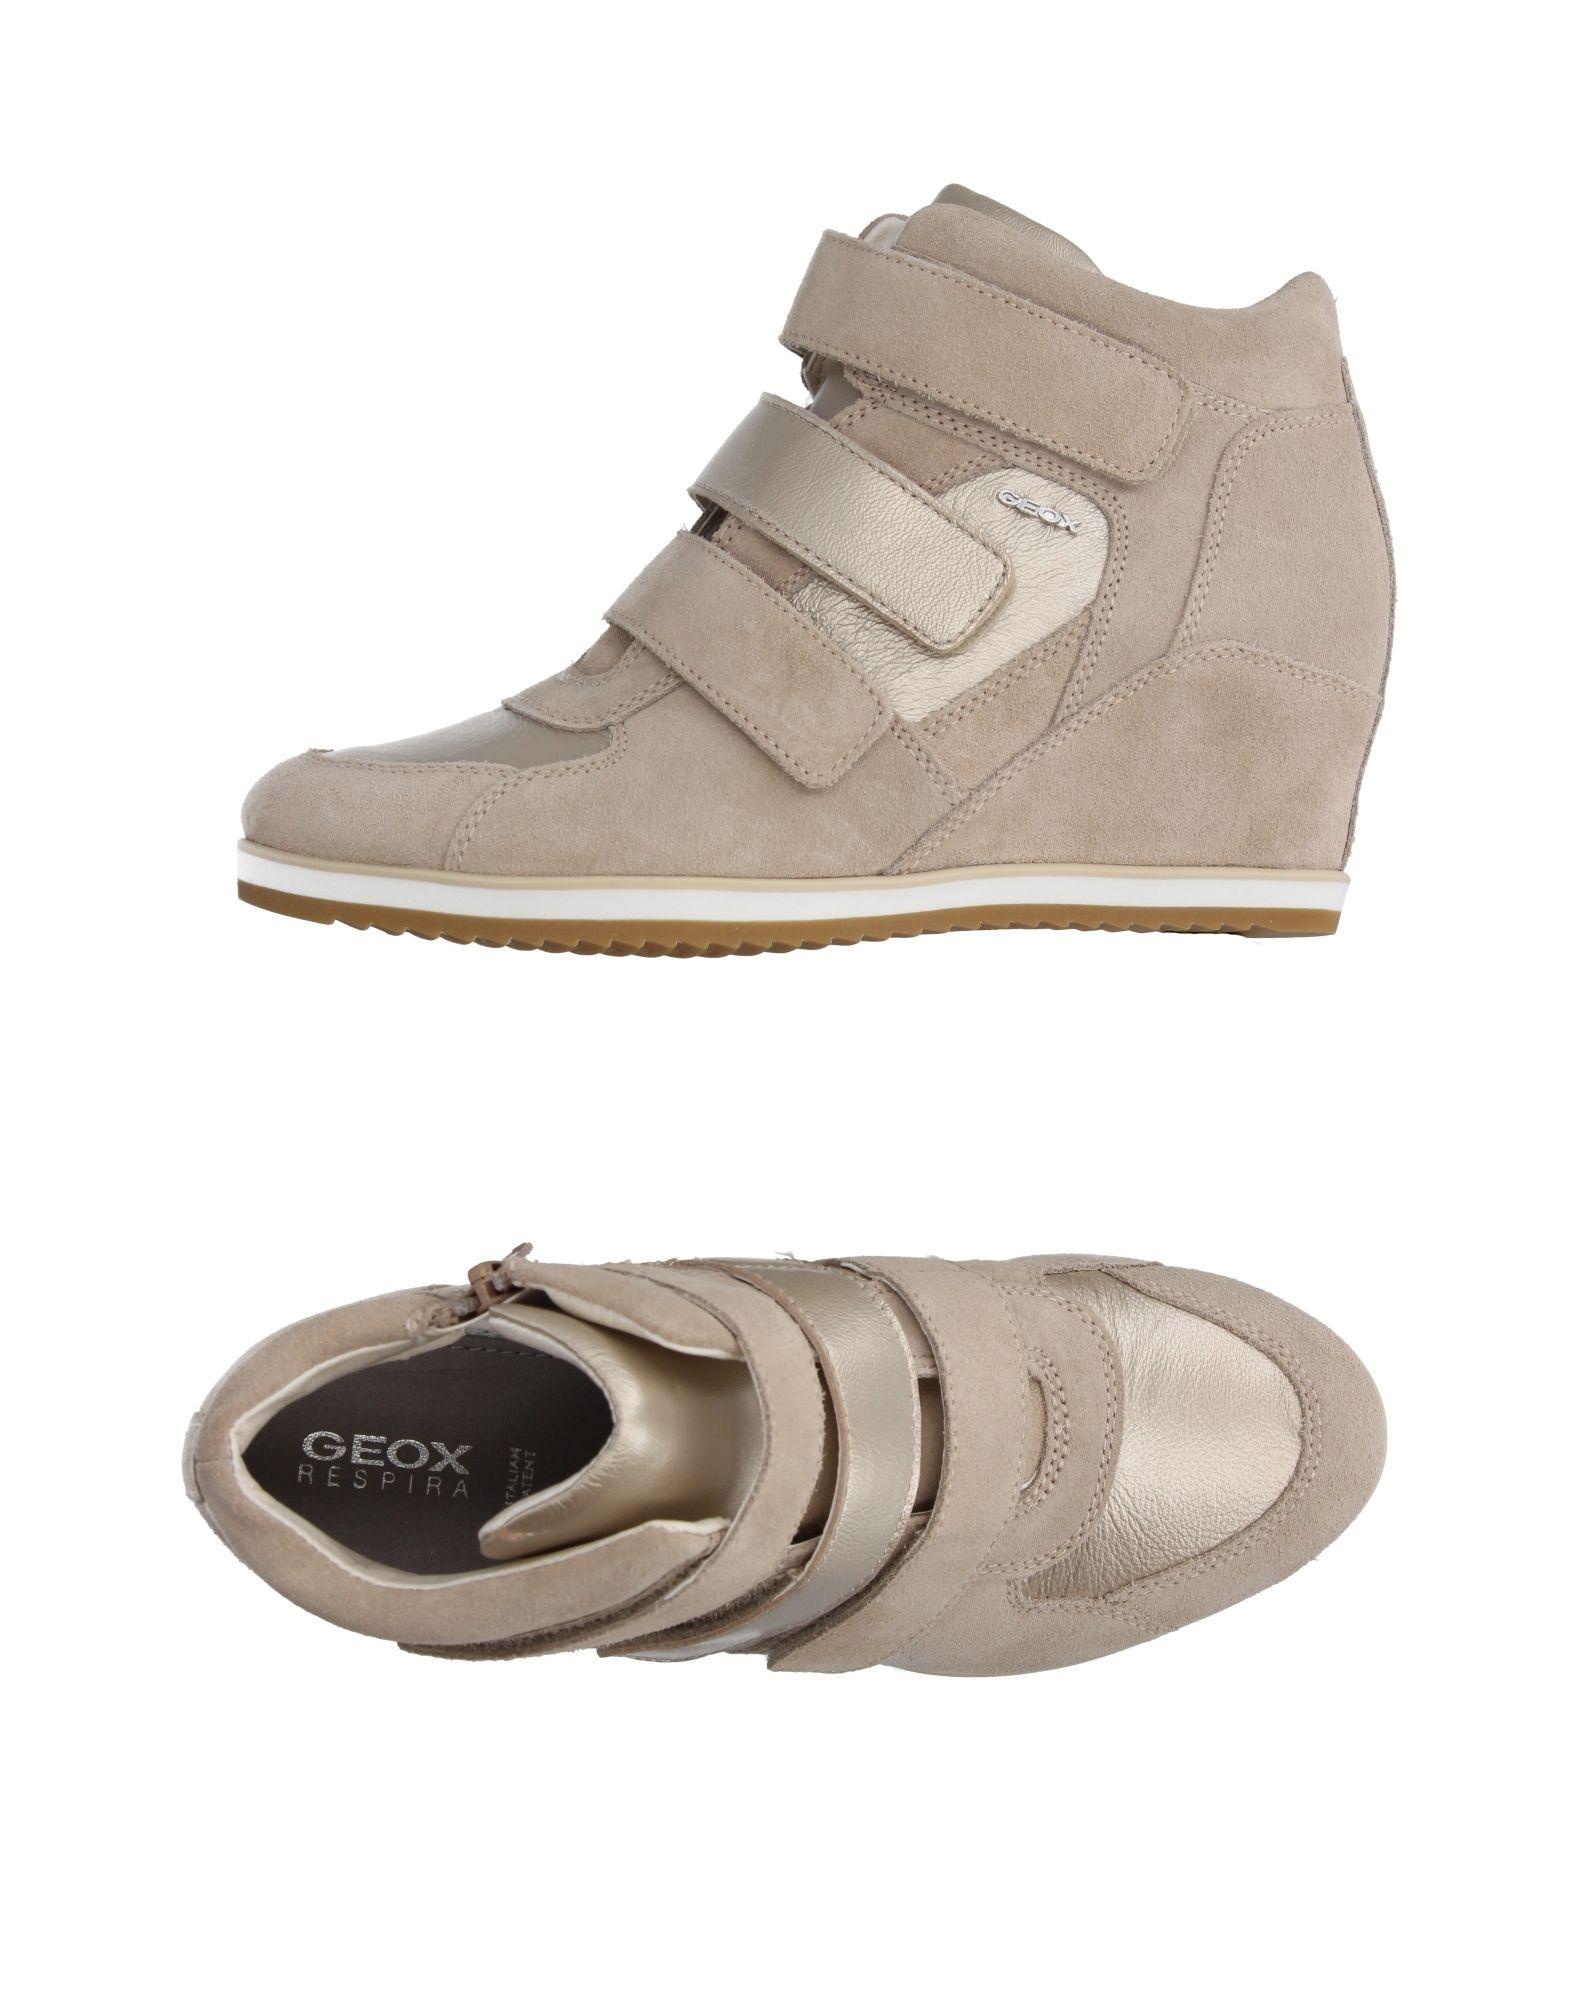 Geox Sneakers Damen Damen Sneakers  11217026AJ  d2eb80